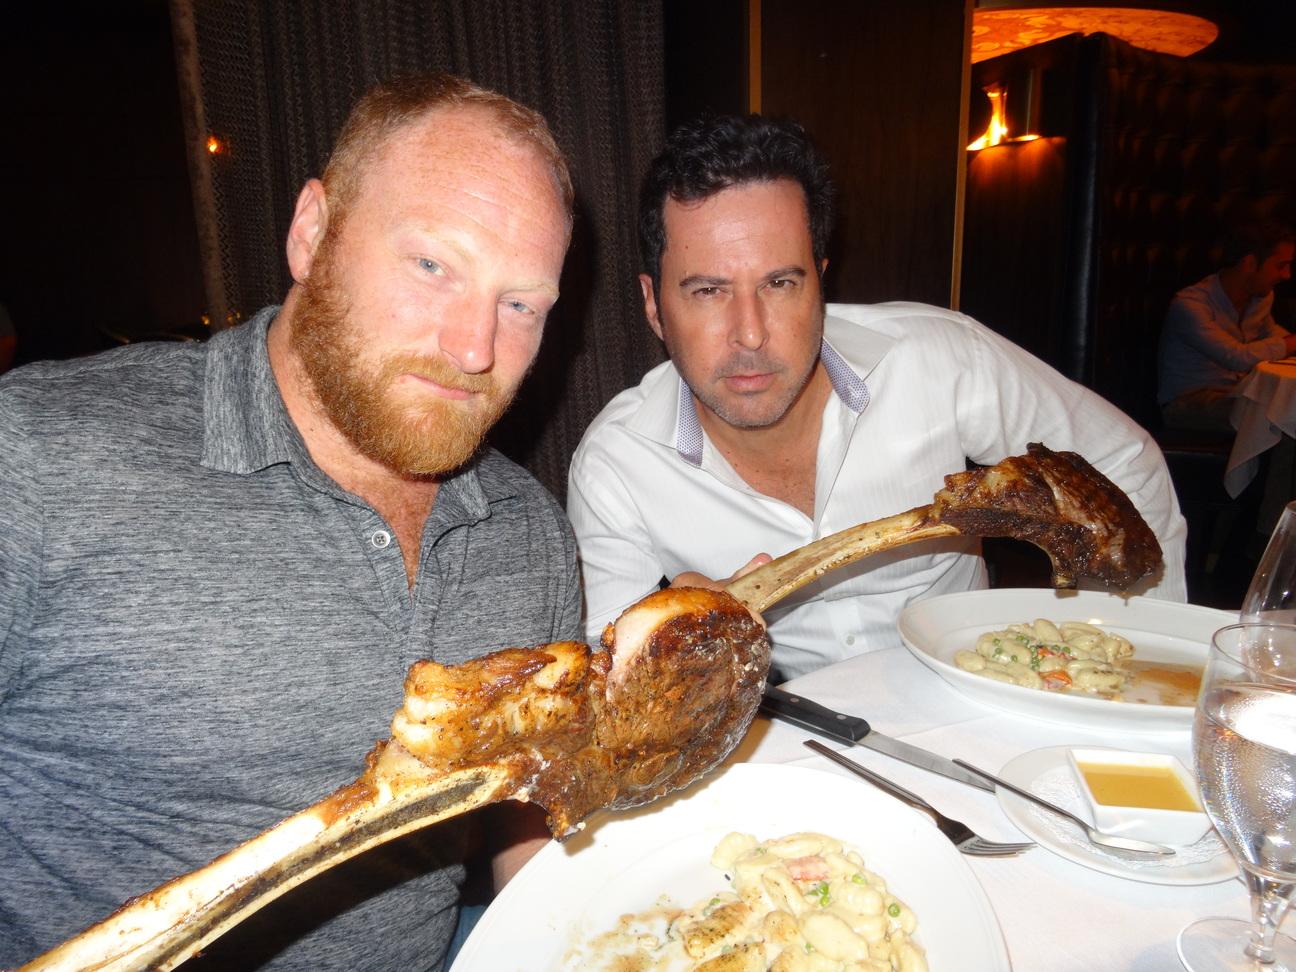 Jonathan Silverman and Mac Brandt